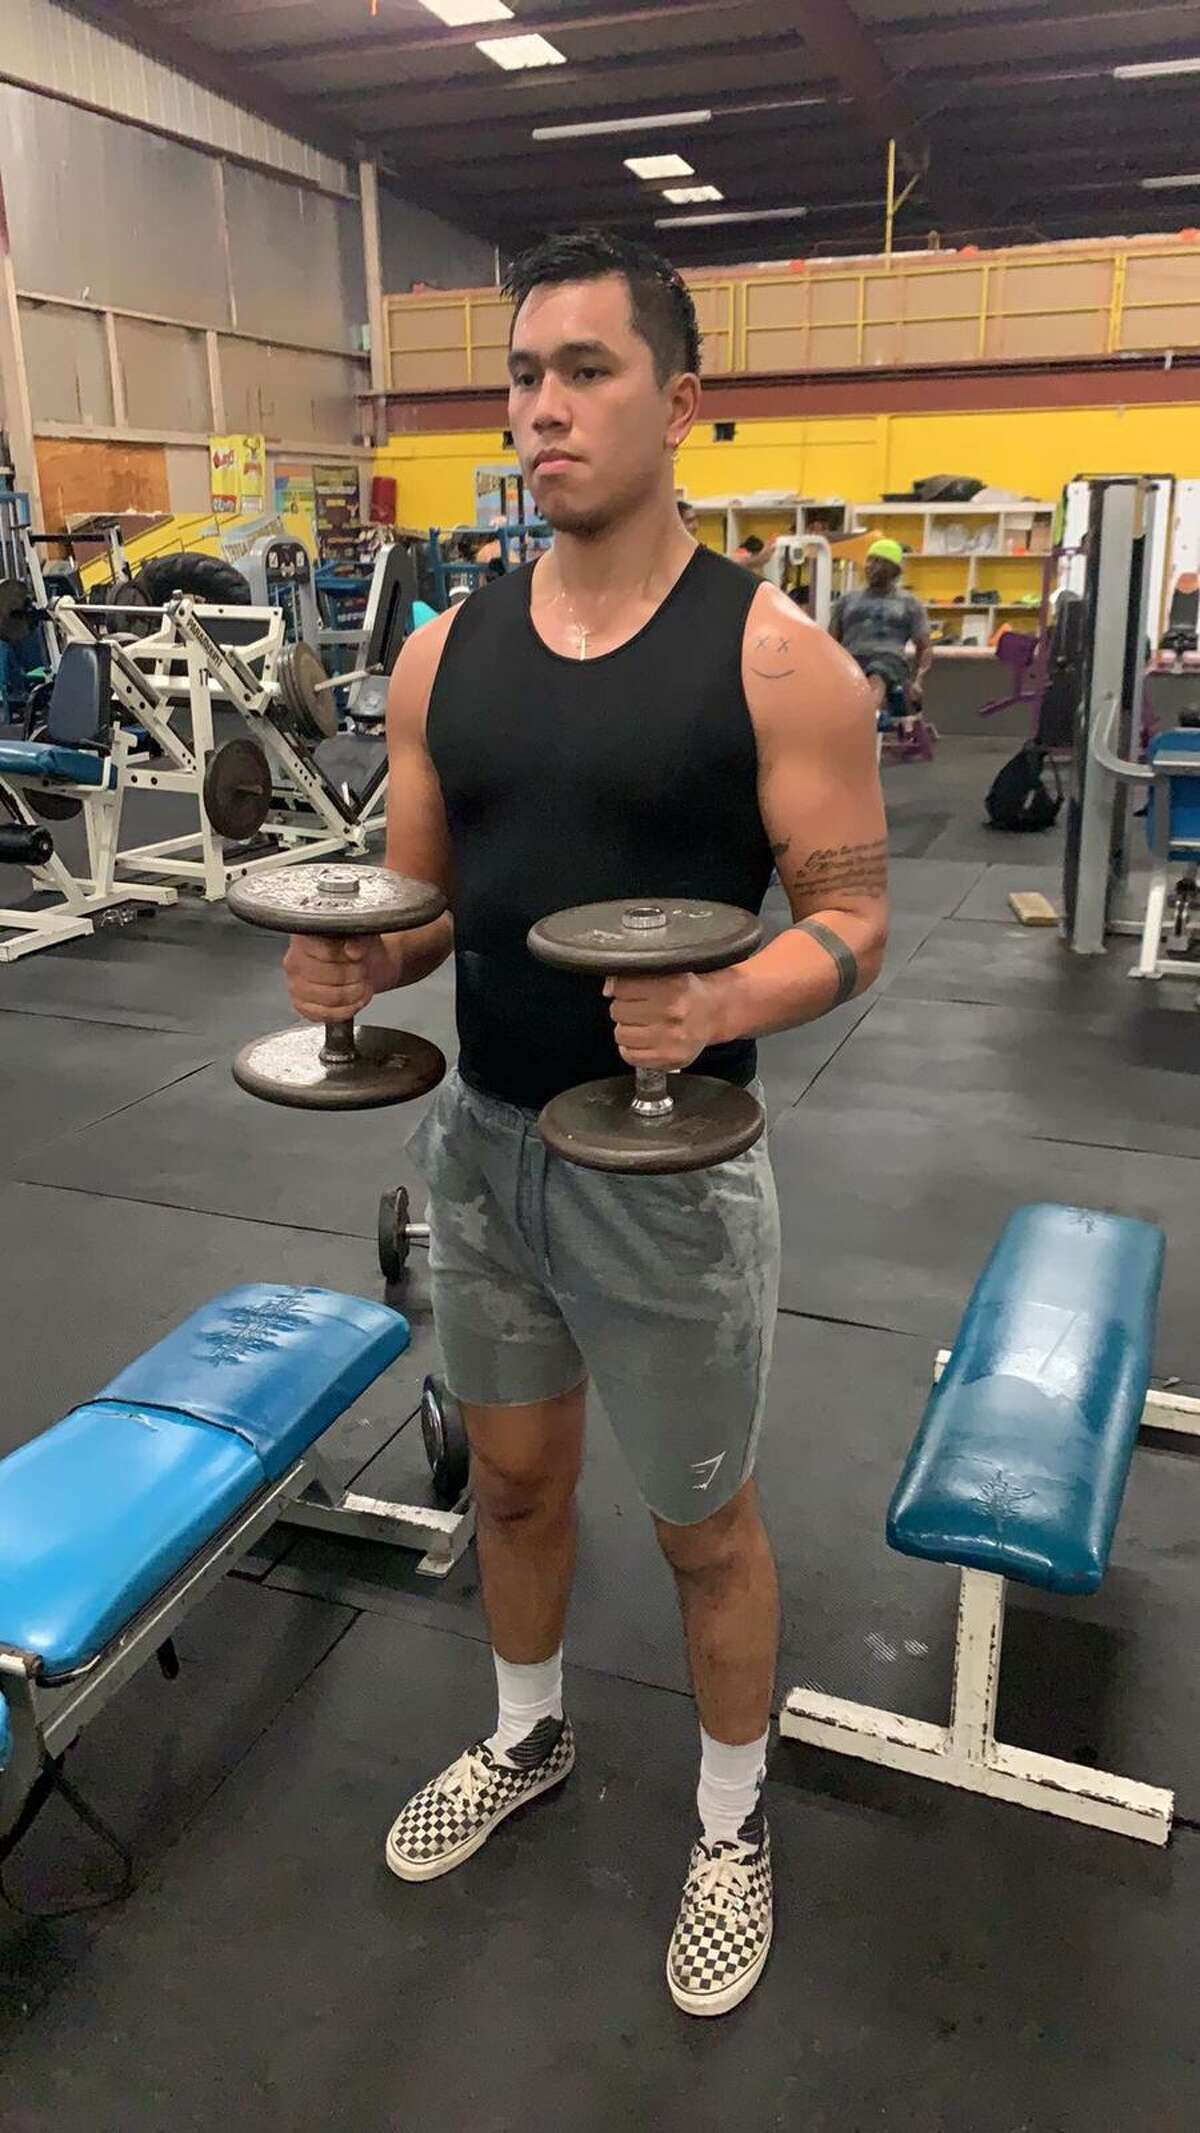 Joshua Dang at Iron Body Gym